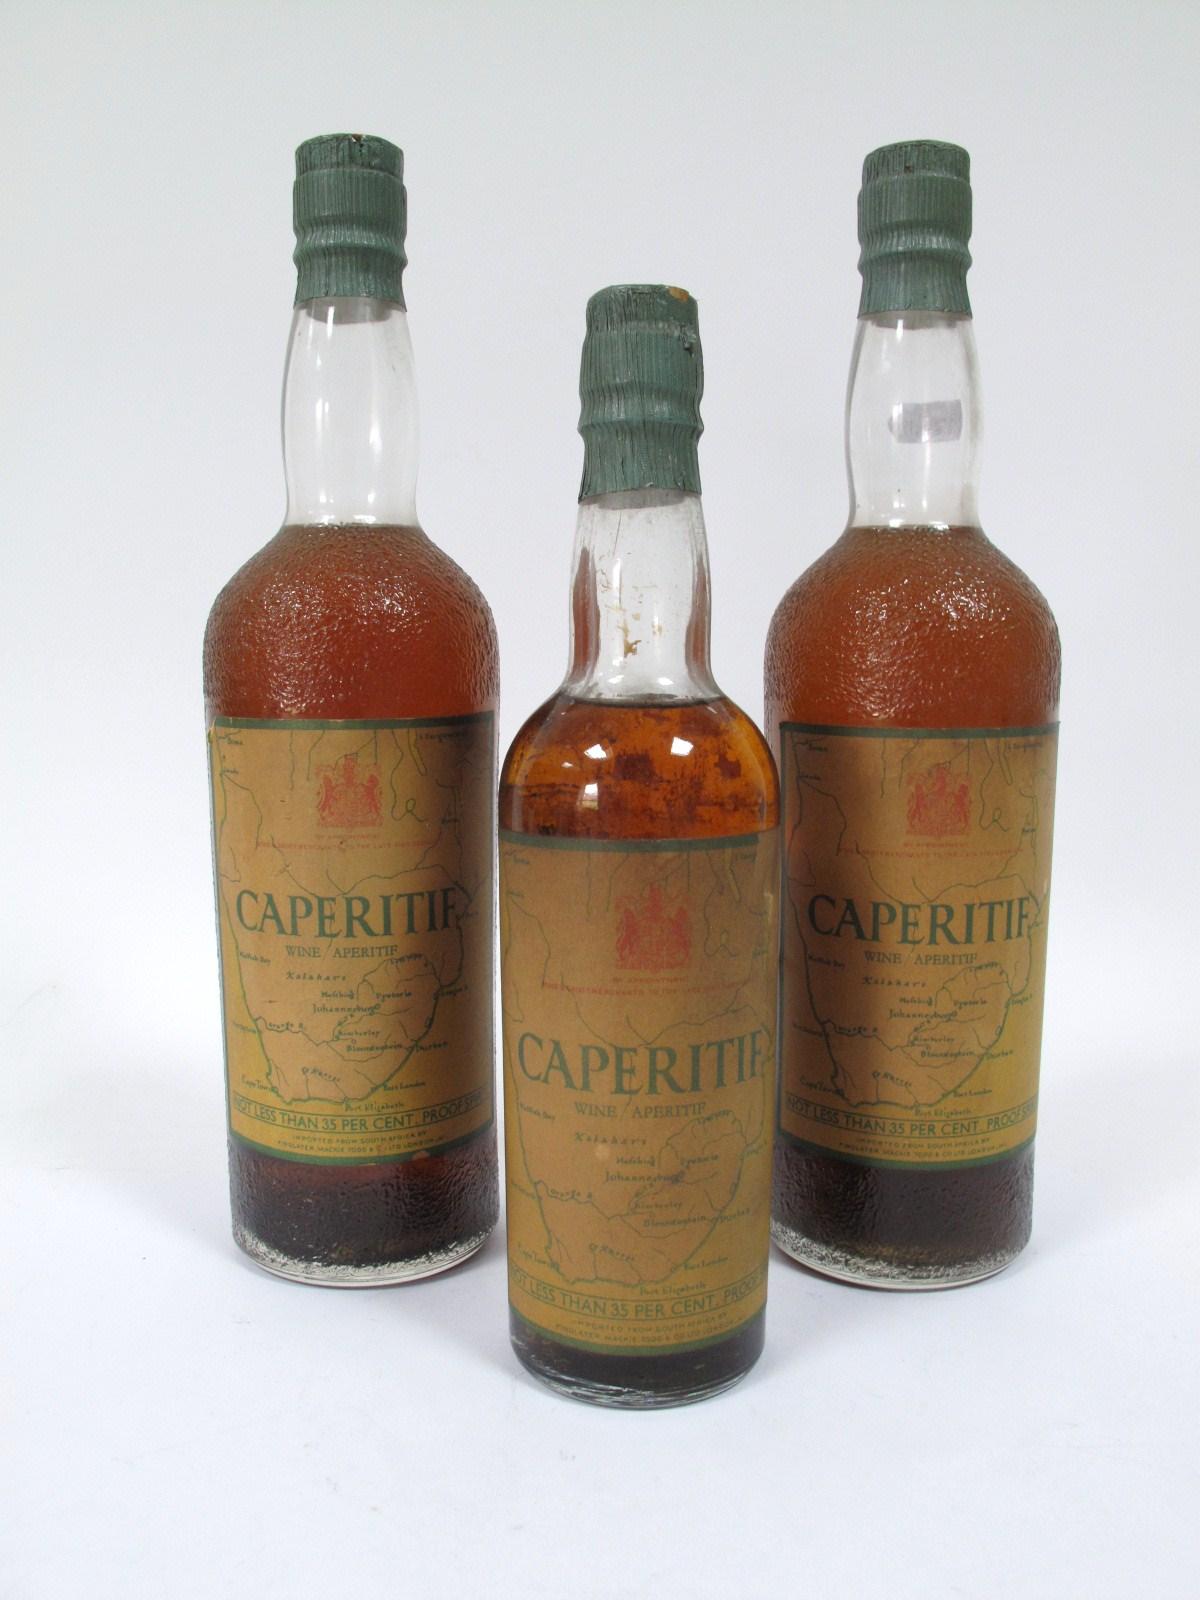 Lot 893 - WINES - Caperitif Wine Aperitif, (2 bottles); Caperitif Wine Aperitif, 35cl. (3)